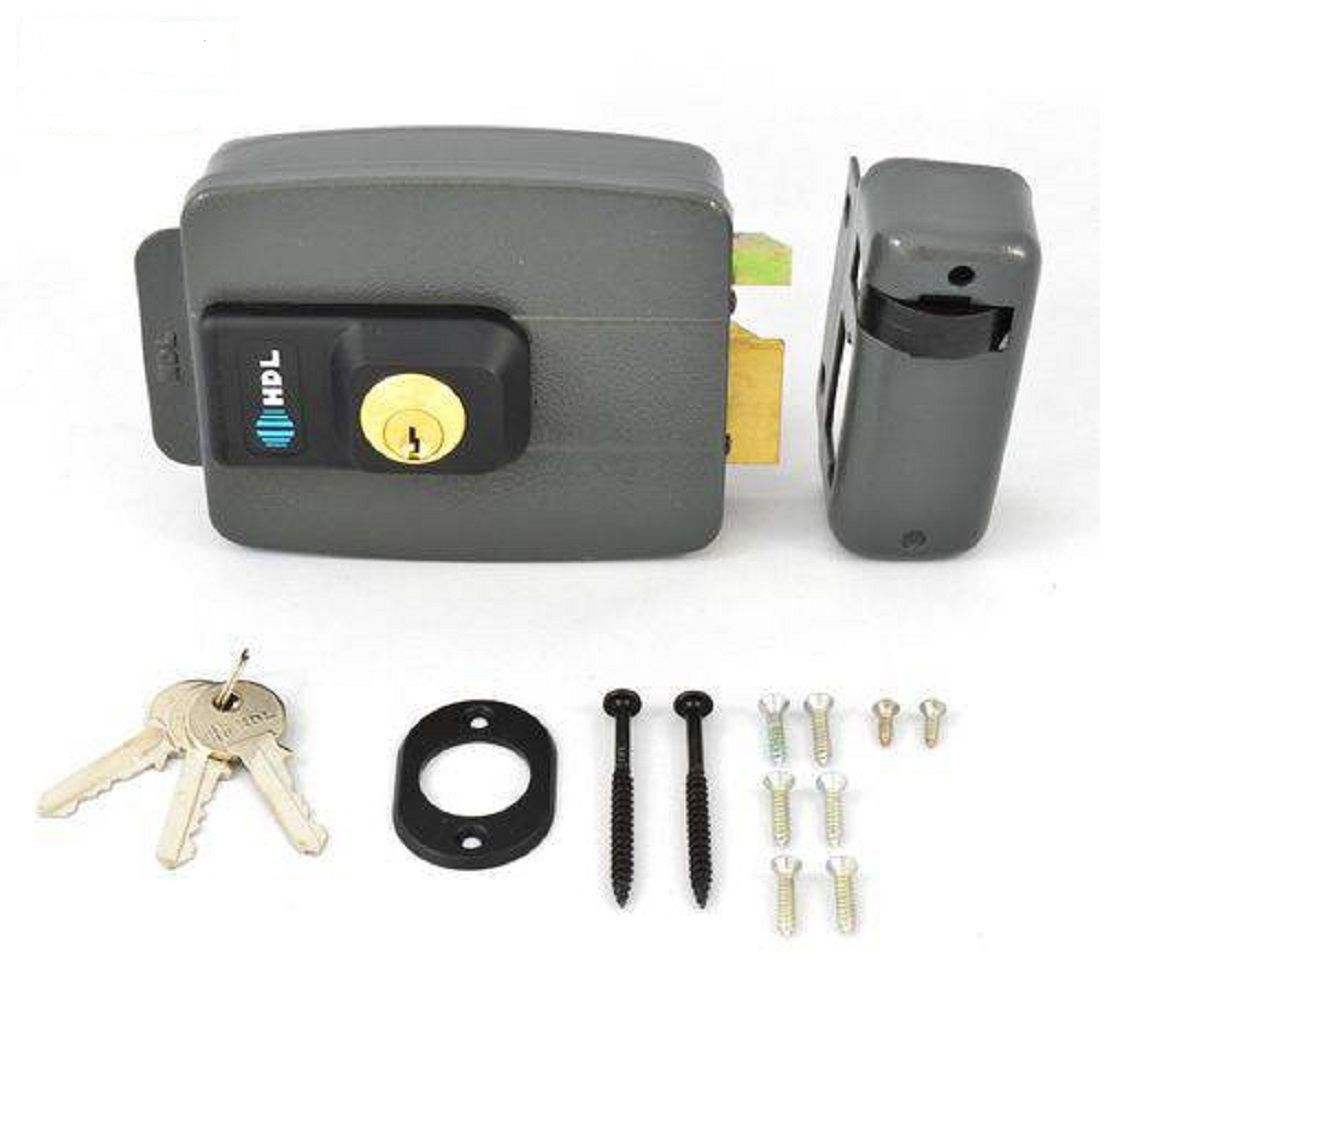 Kit Interfone Residencial Hdl F8 Com Fechadura Elétrica C90 Cinza